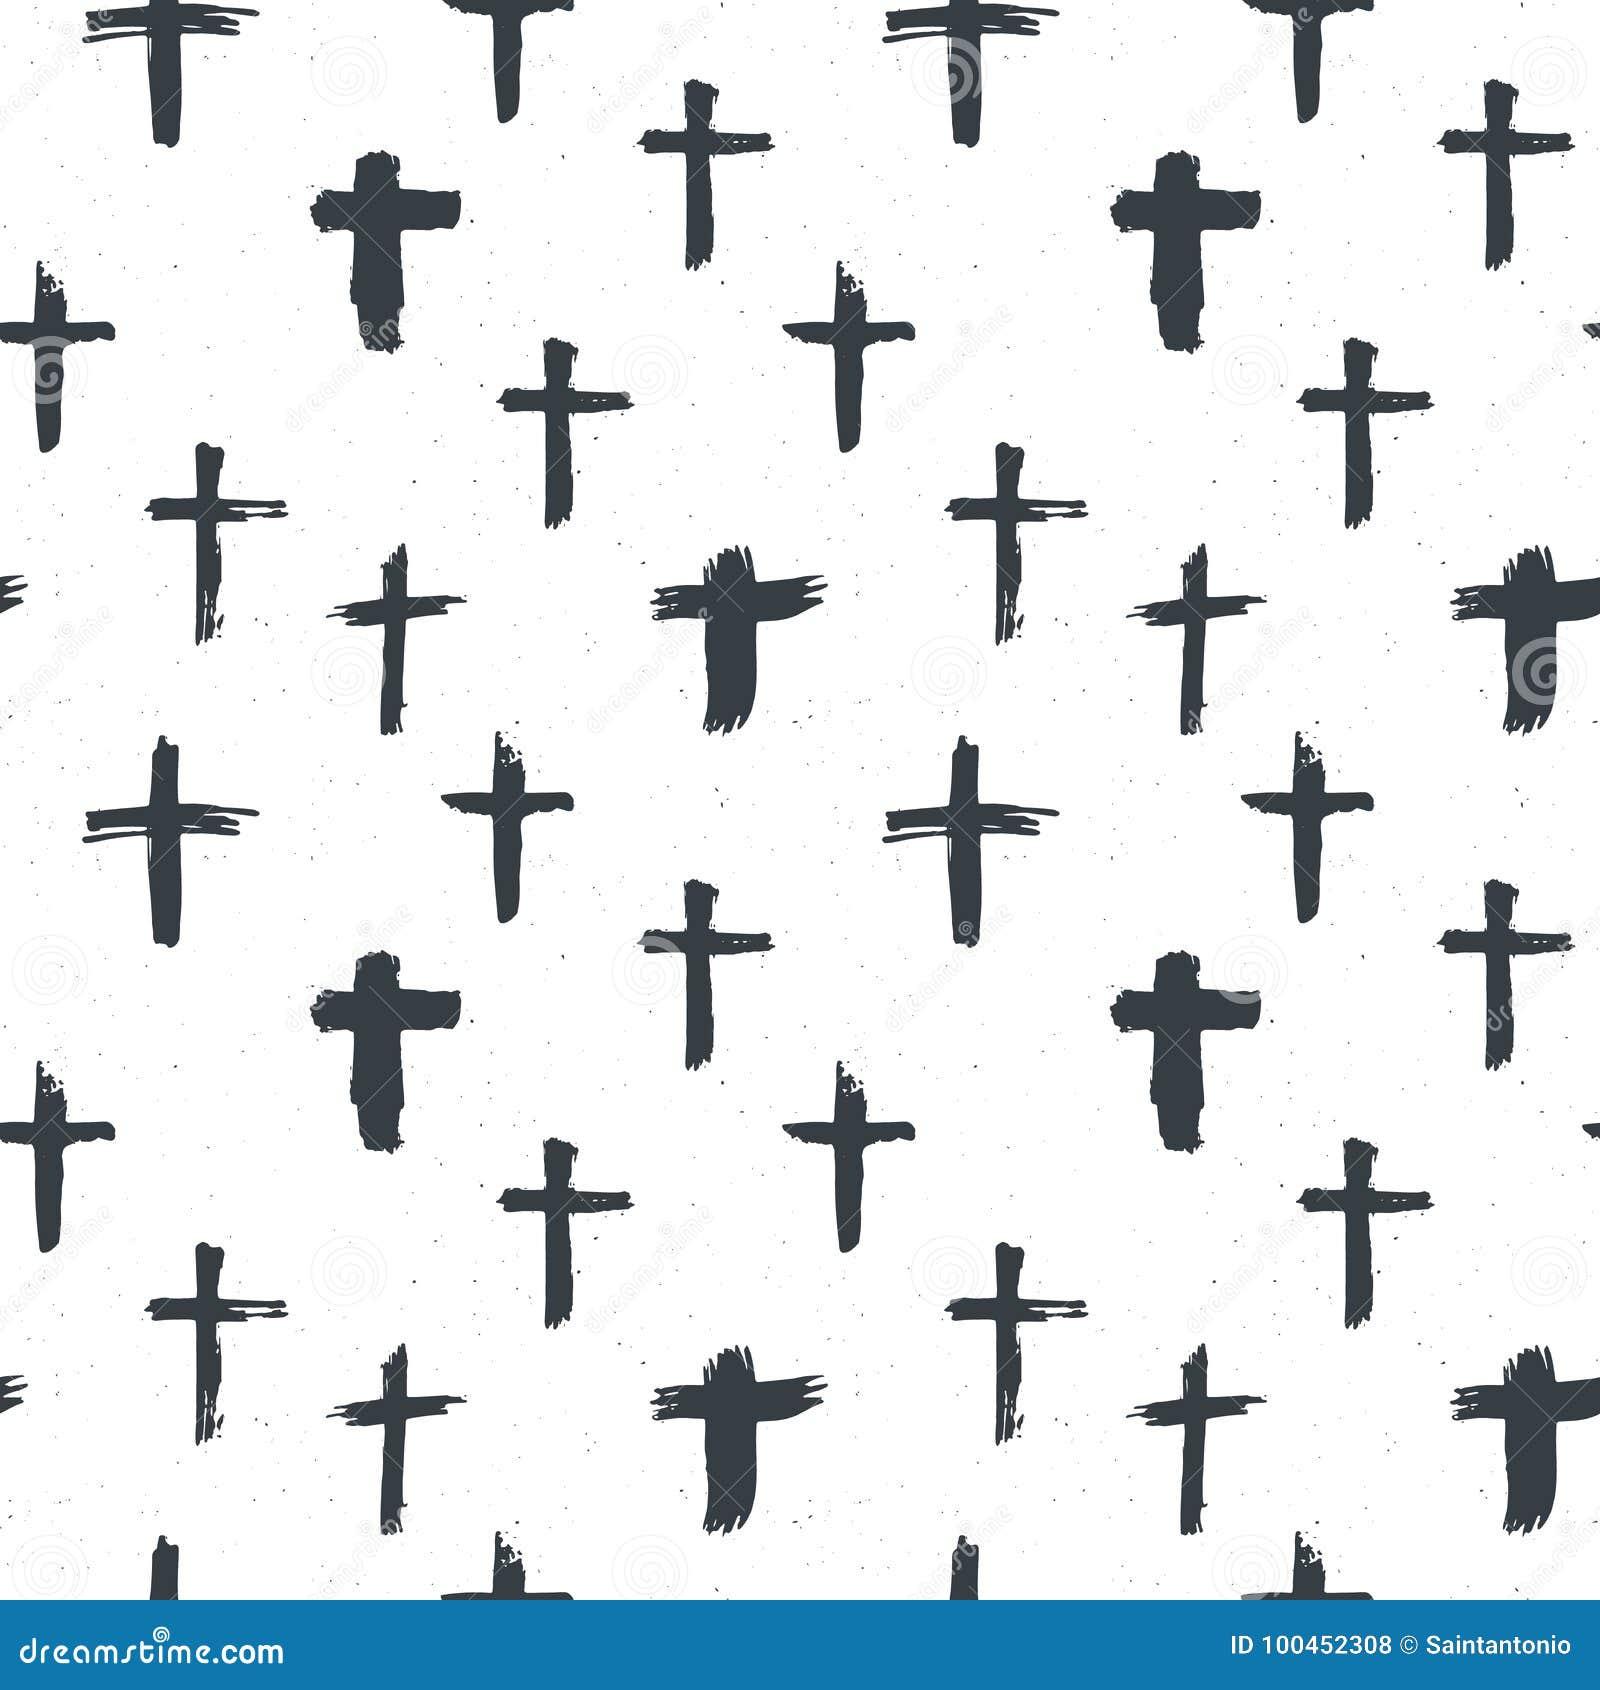 Cross Symbols Seamless Pattern Grunge Hand Drawn Christian Crosses